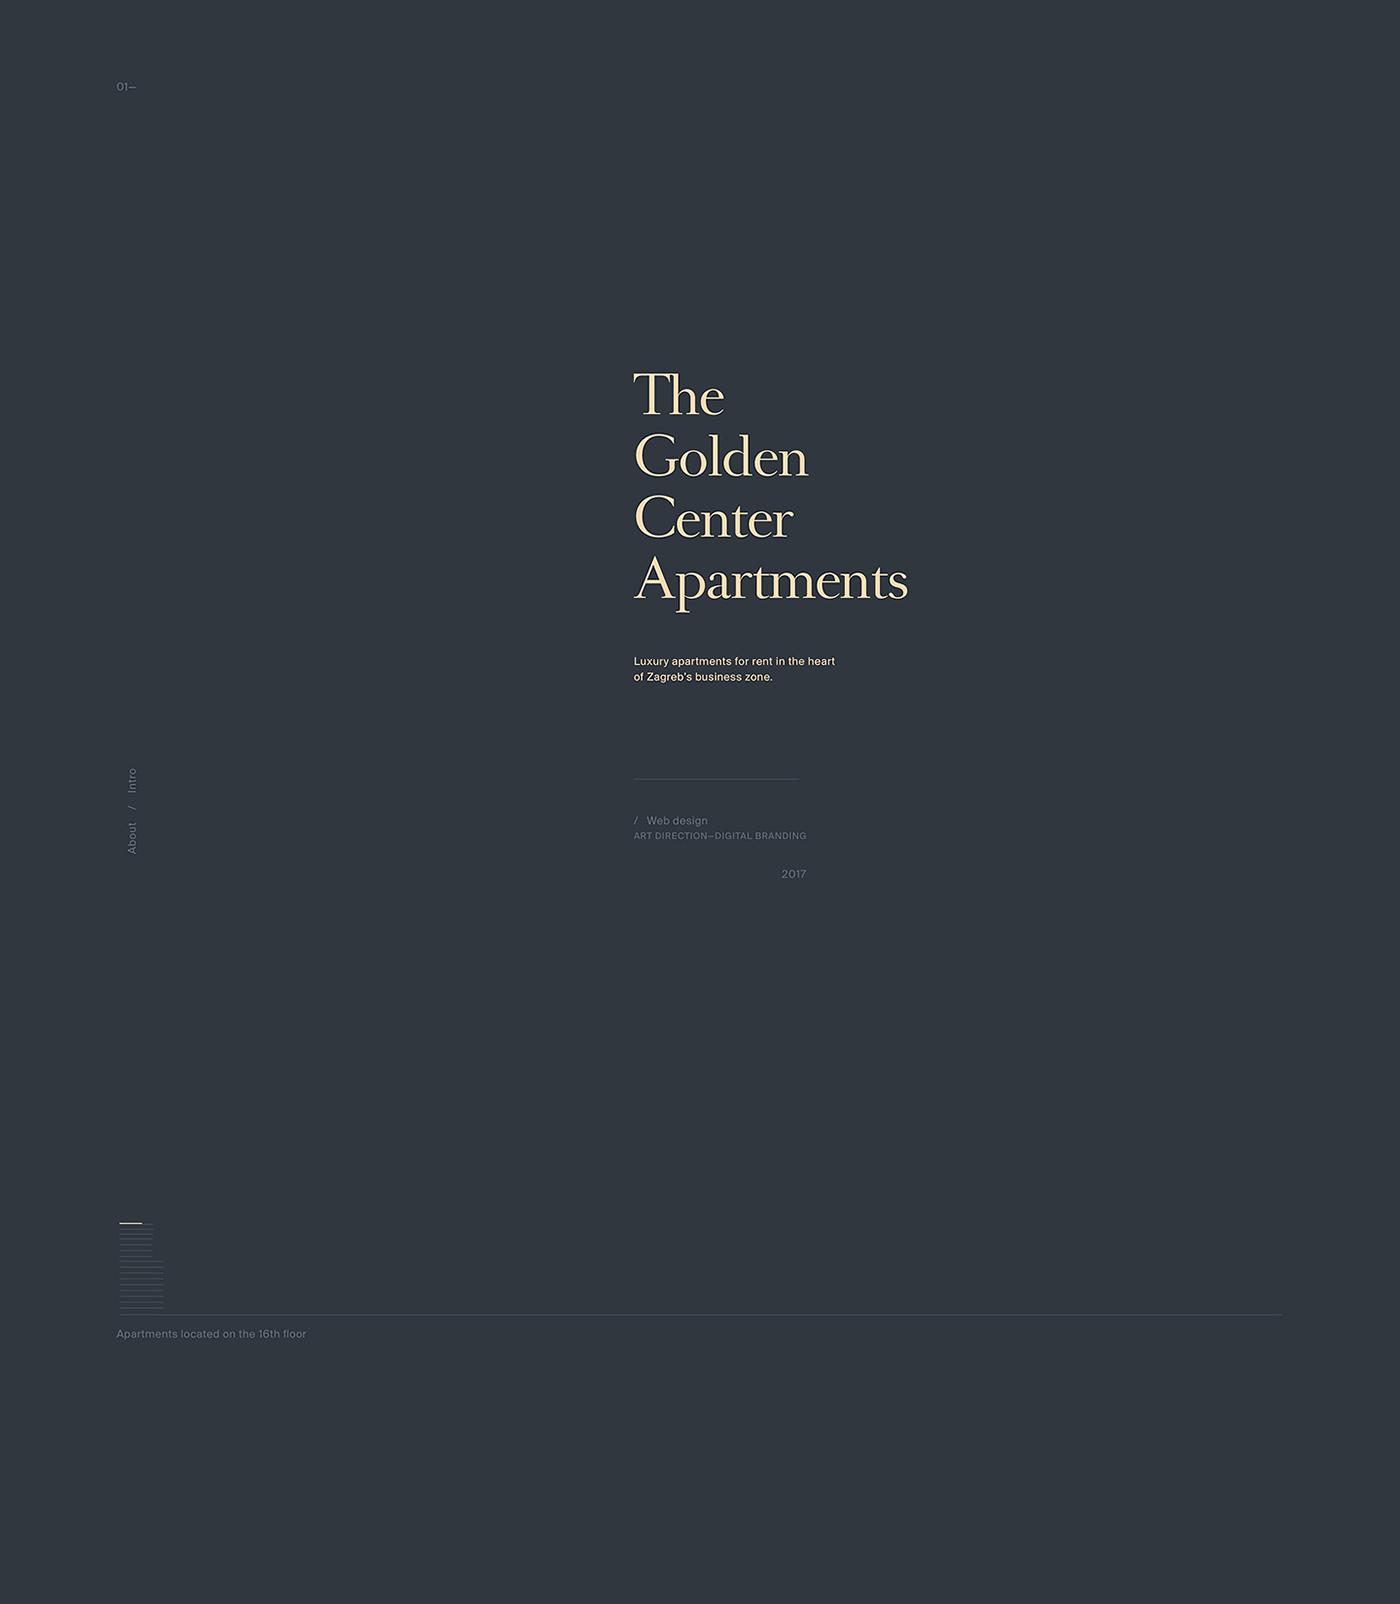 Golden Center Apartments —Web / Branding on Behance